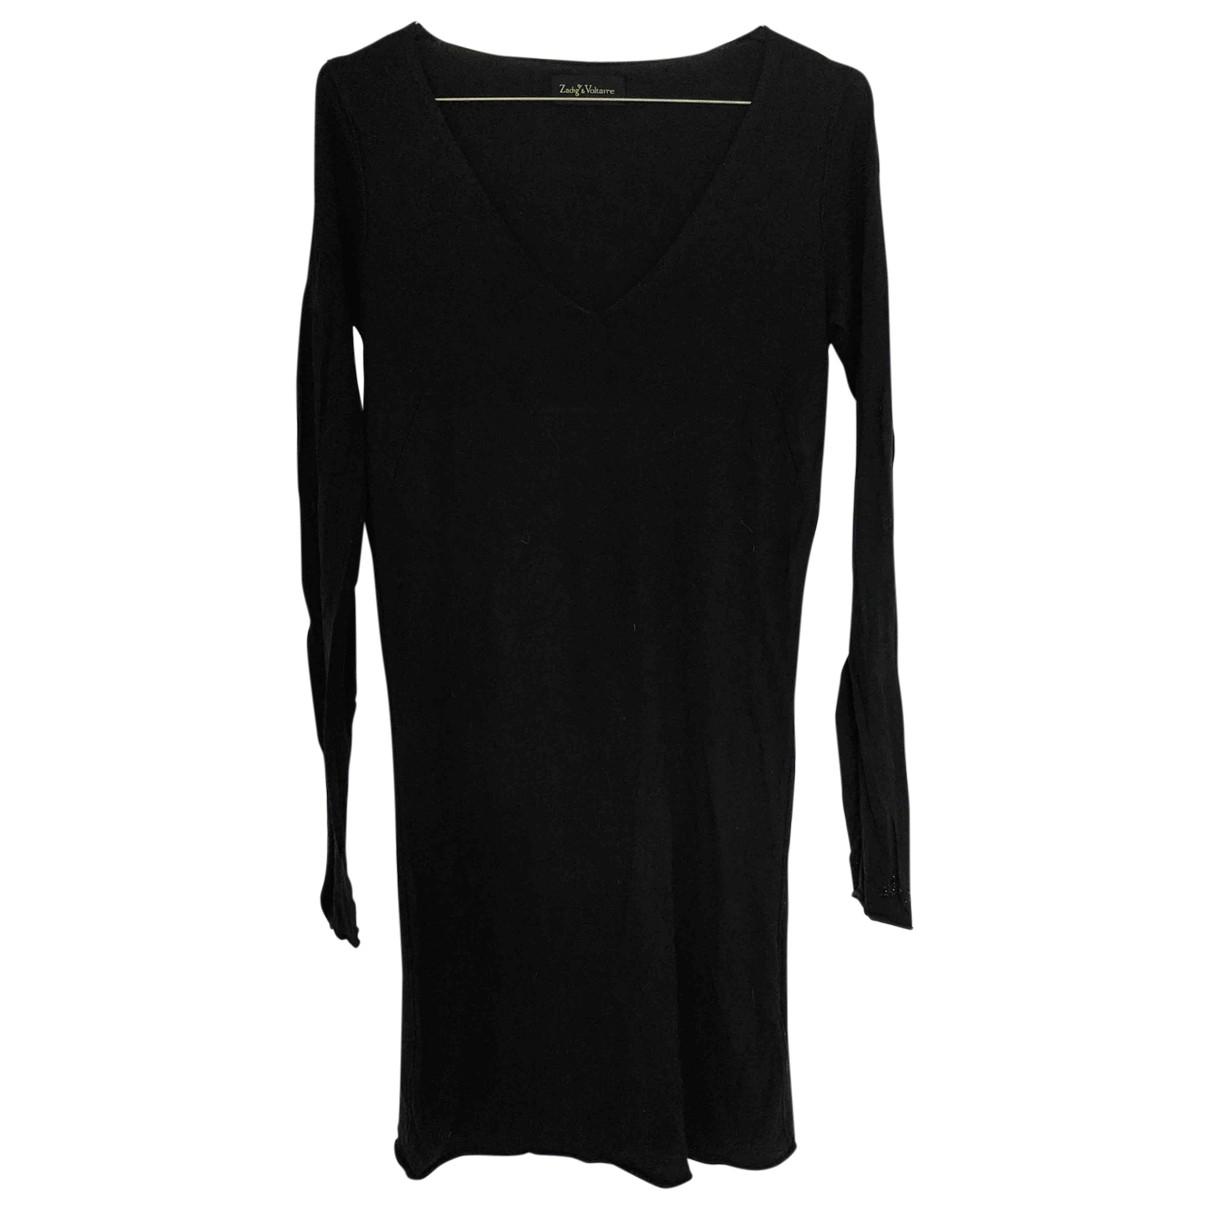 Zadig & Voltaire \N Black Silk dress for Women S International